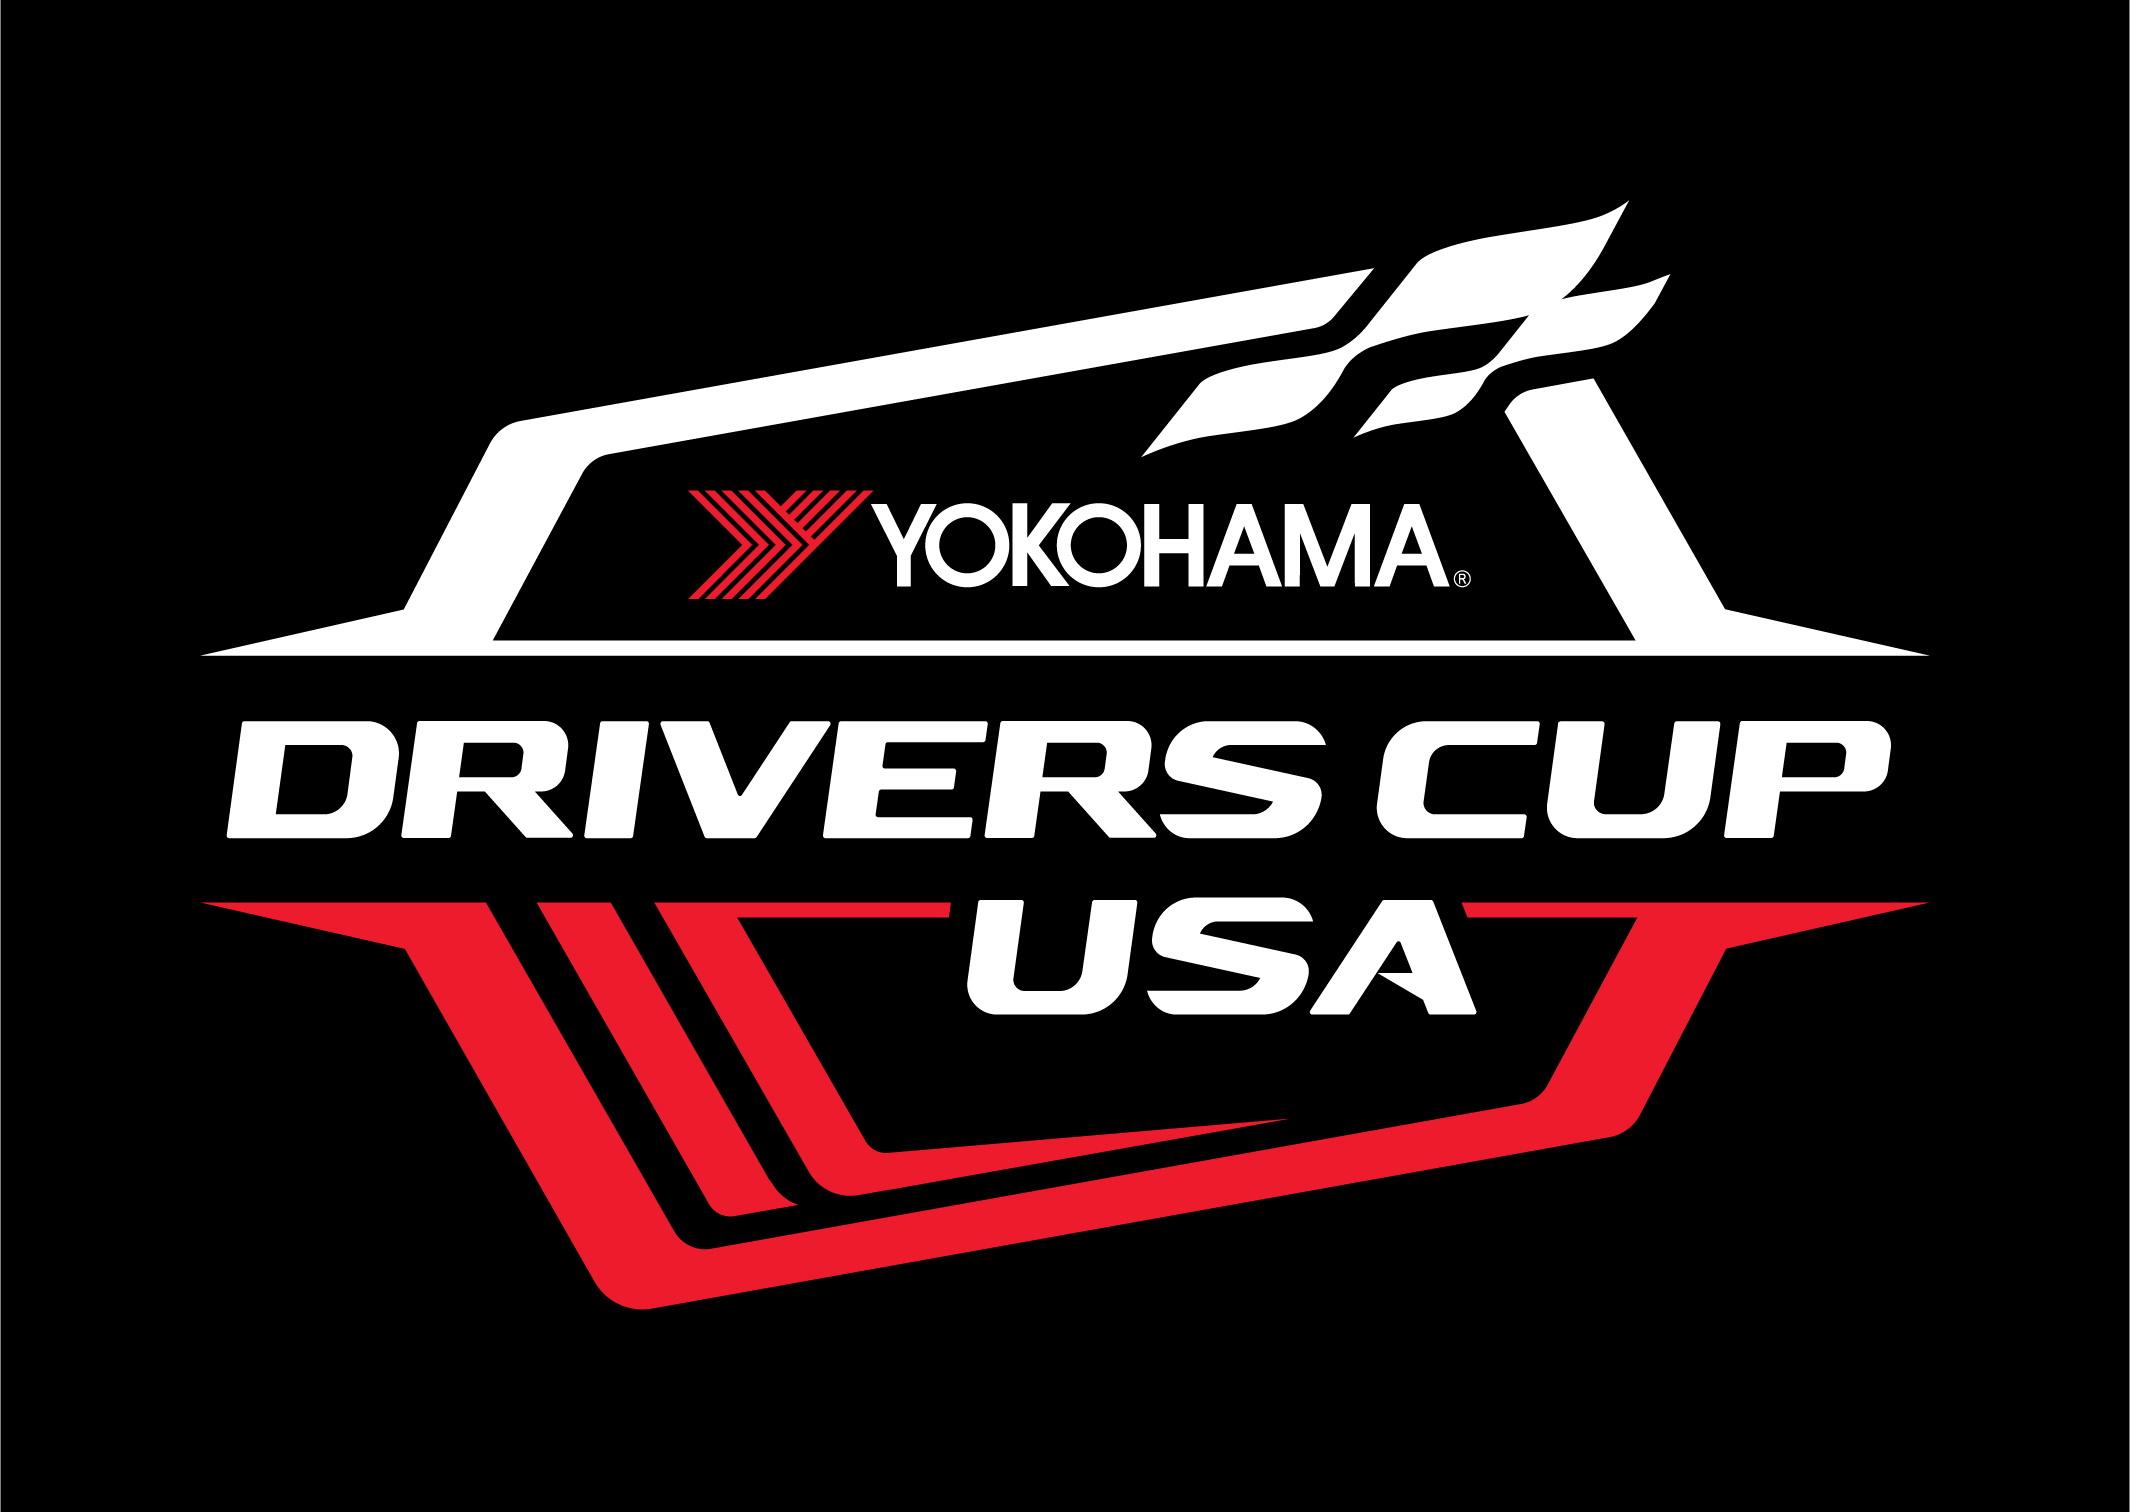 Yokohama Tire Named Title Sponsor of  the 2021 Yokohama Drivers Cup USA